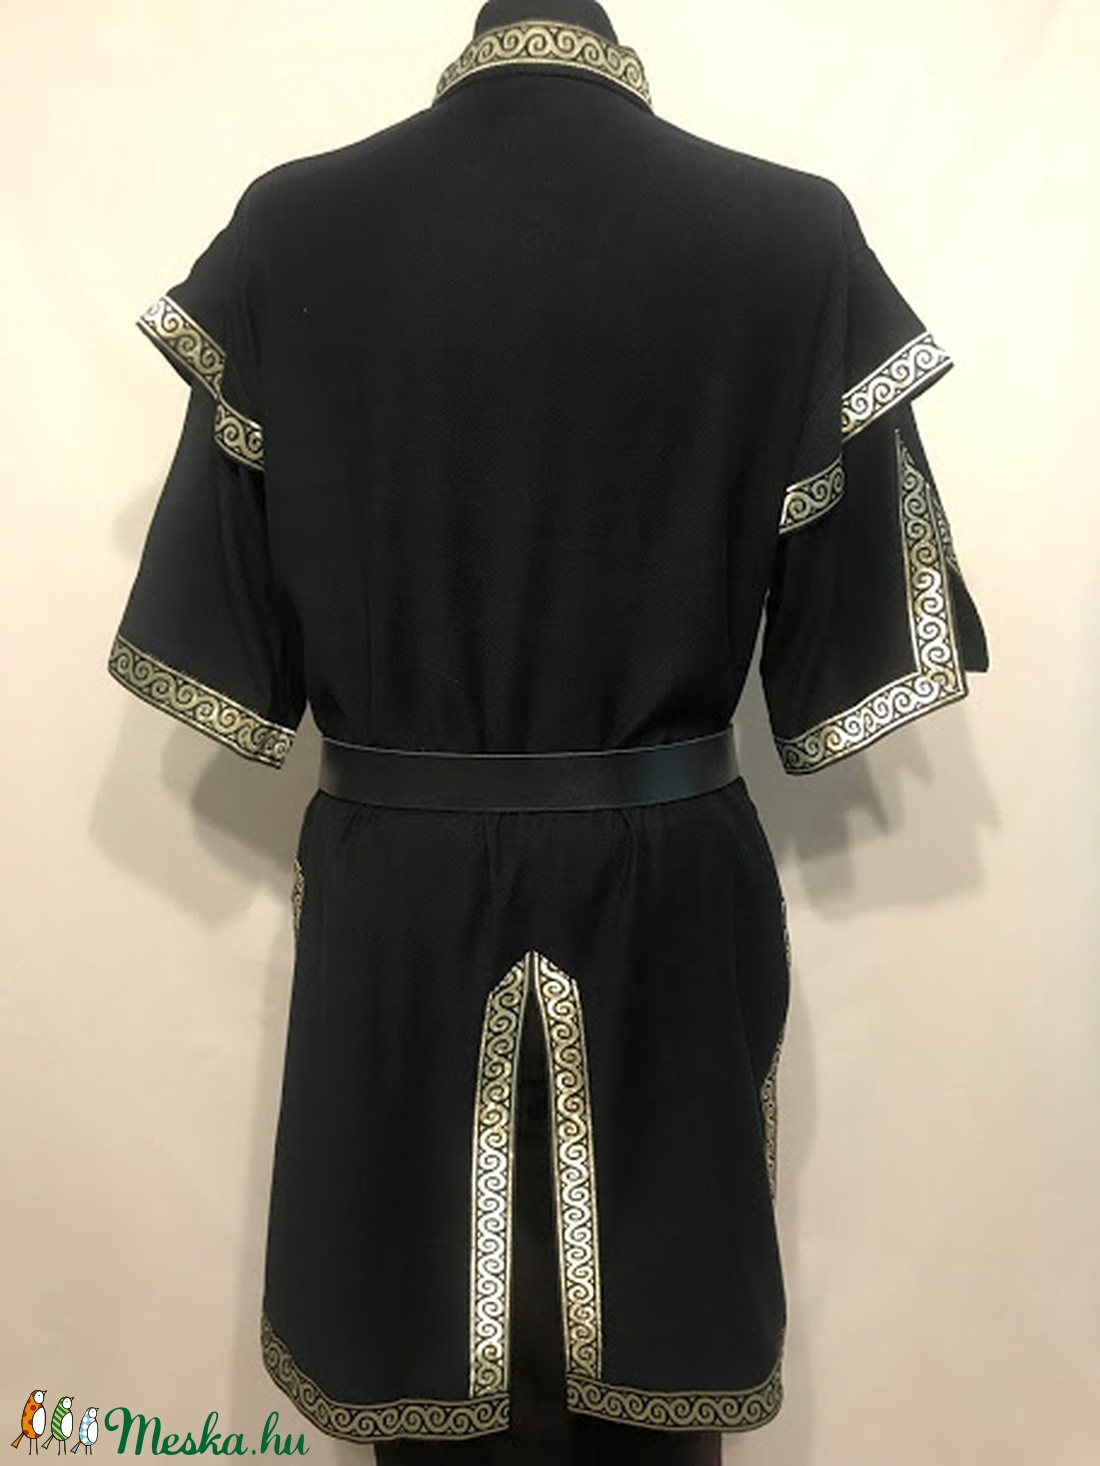 Kaftán fekete-arany mongol fazon - ruha & divat - férfi ruha - Meska.hu